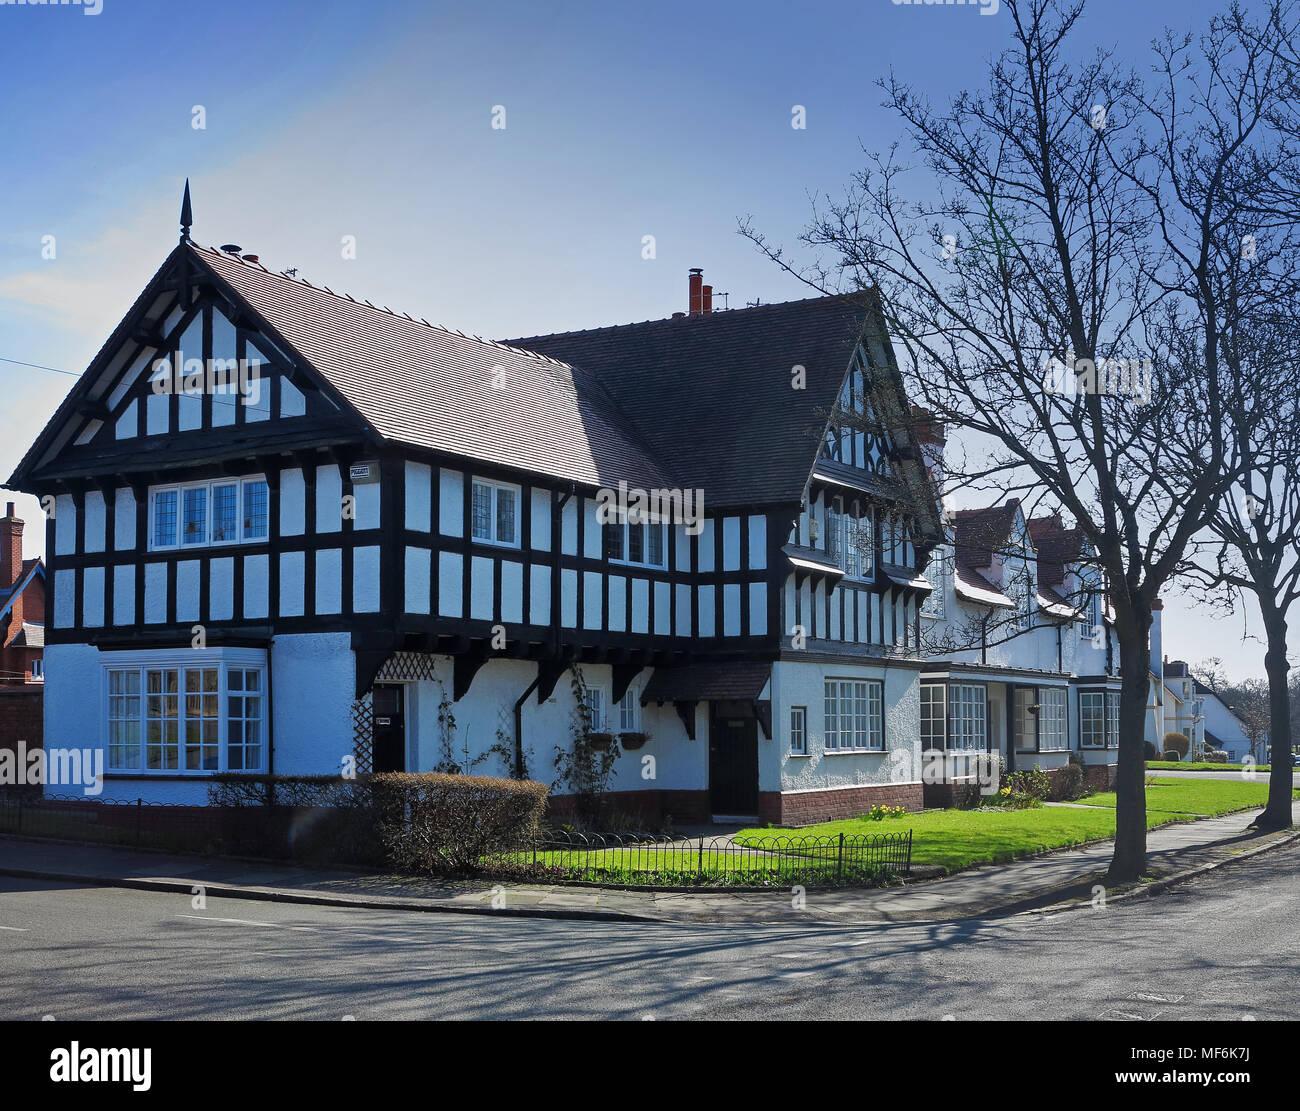 A Tudor-styled house at Port Sunlight Stock Photo